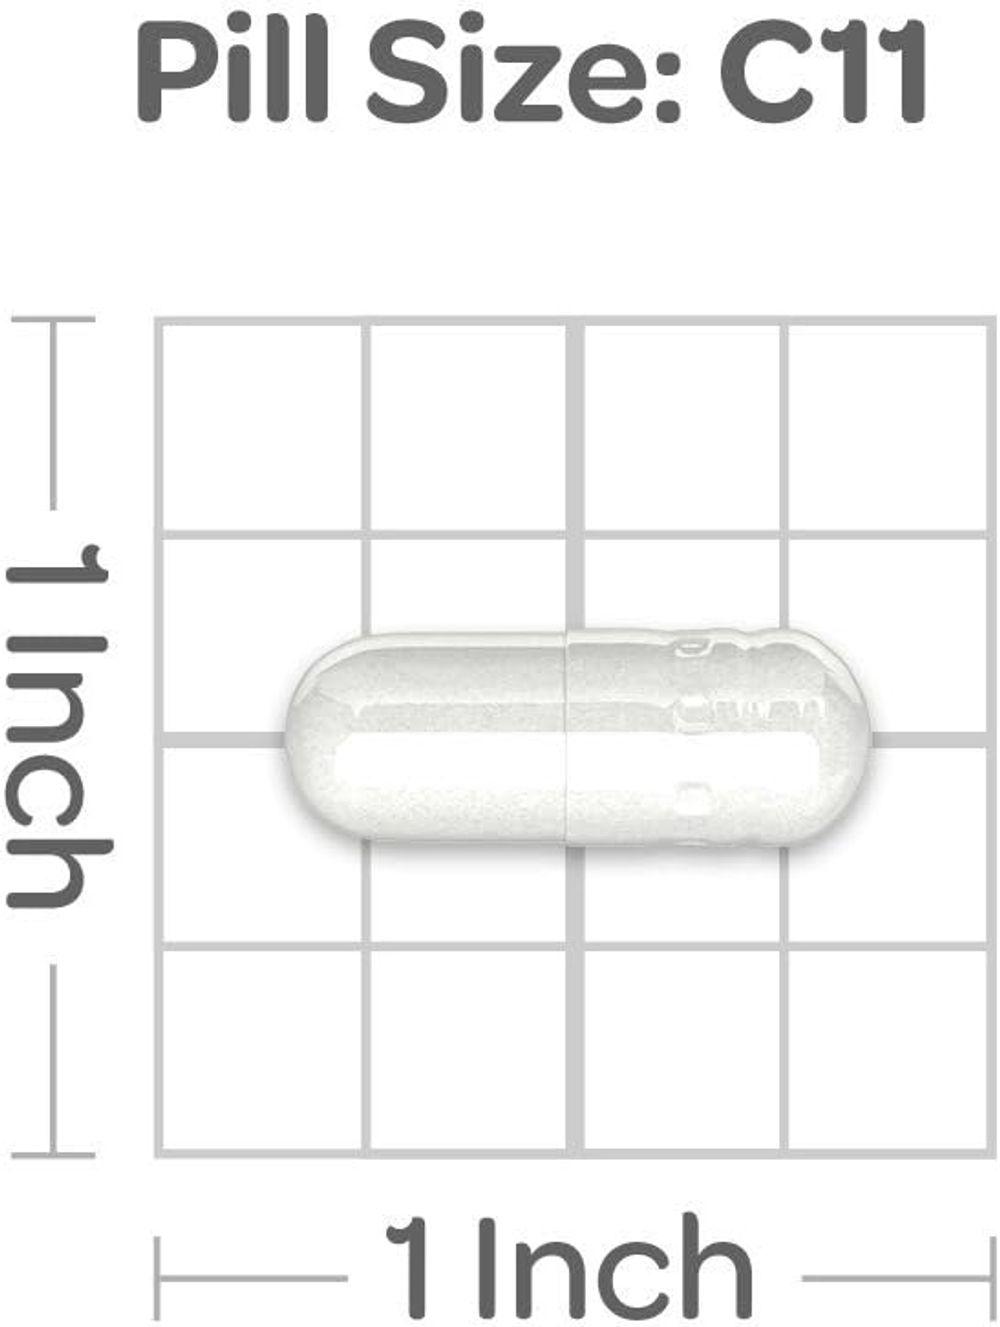 Puritans Pride Black Cherry 1000 mg Capsules, 100 Count